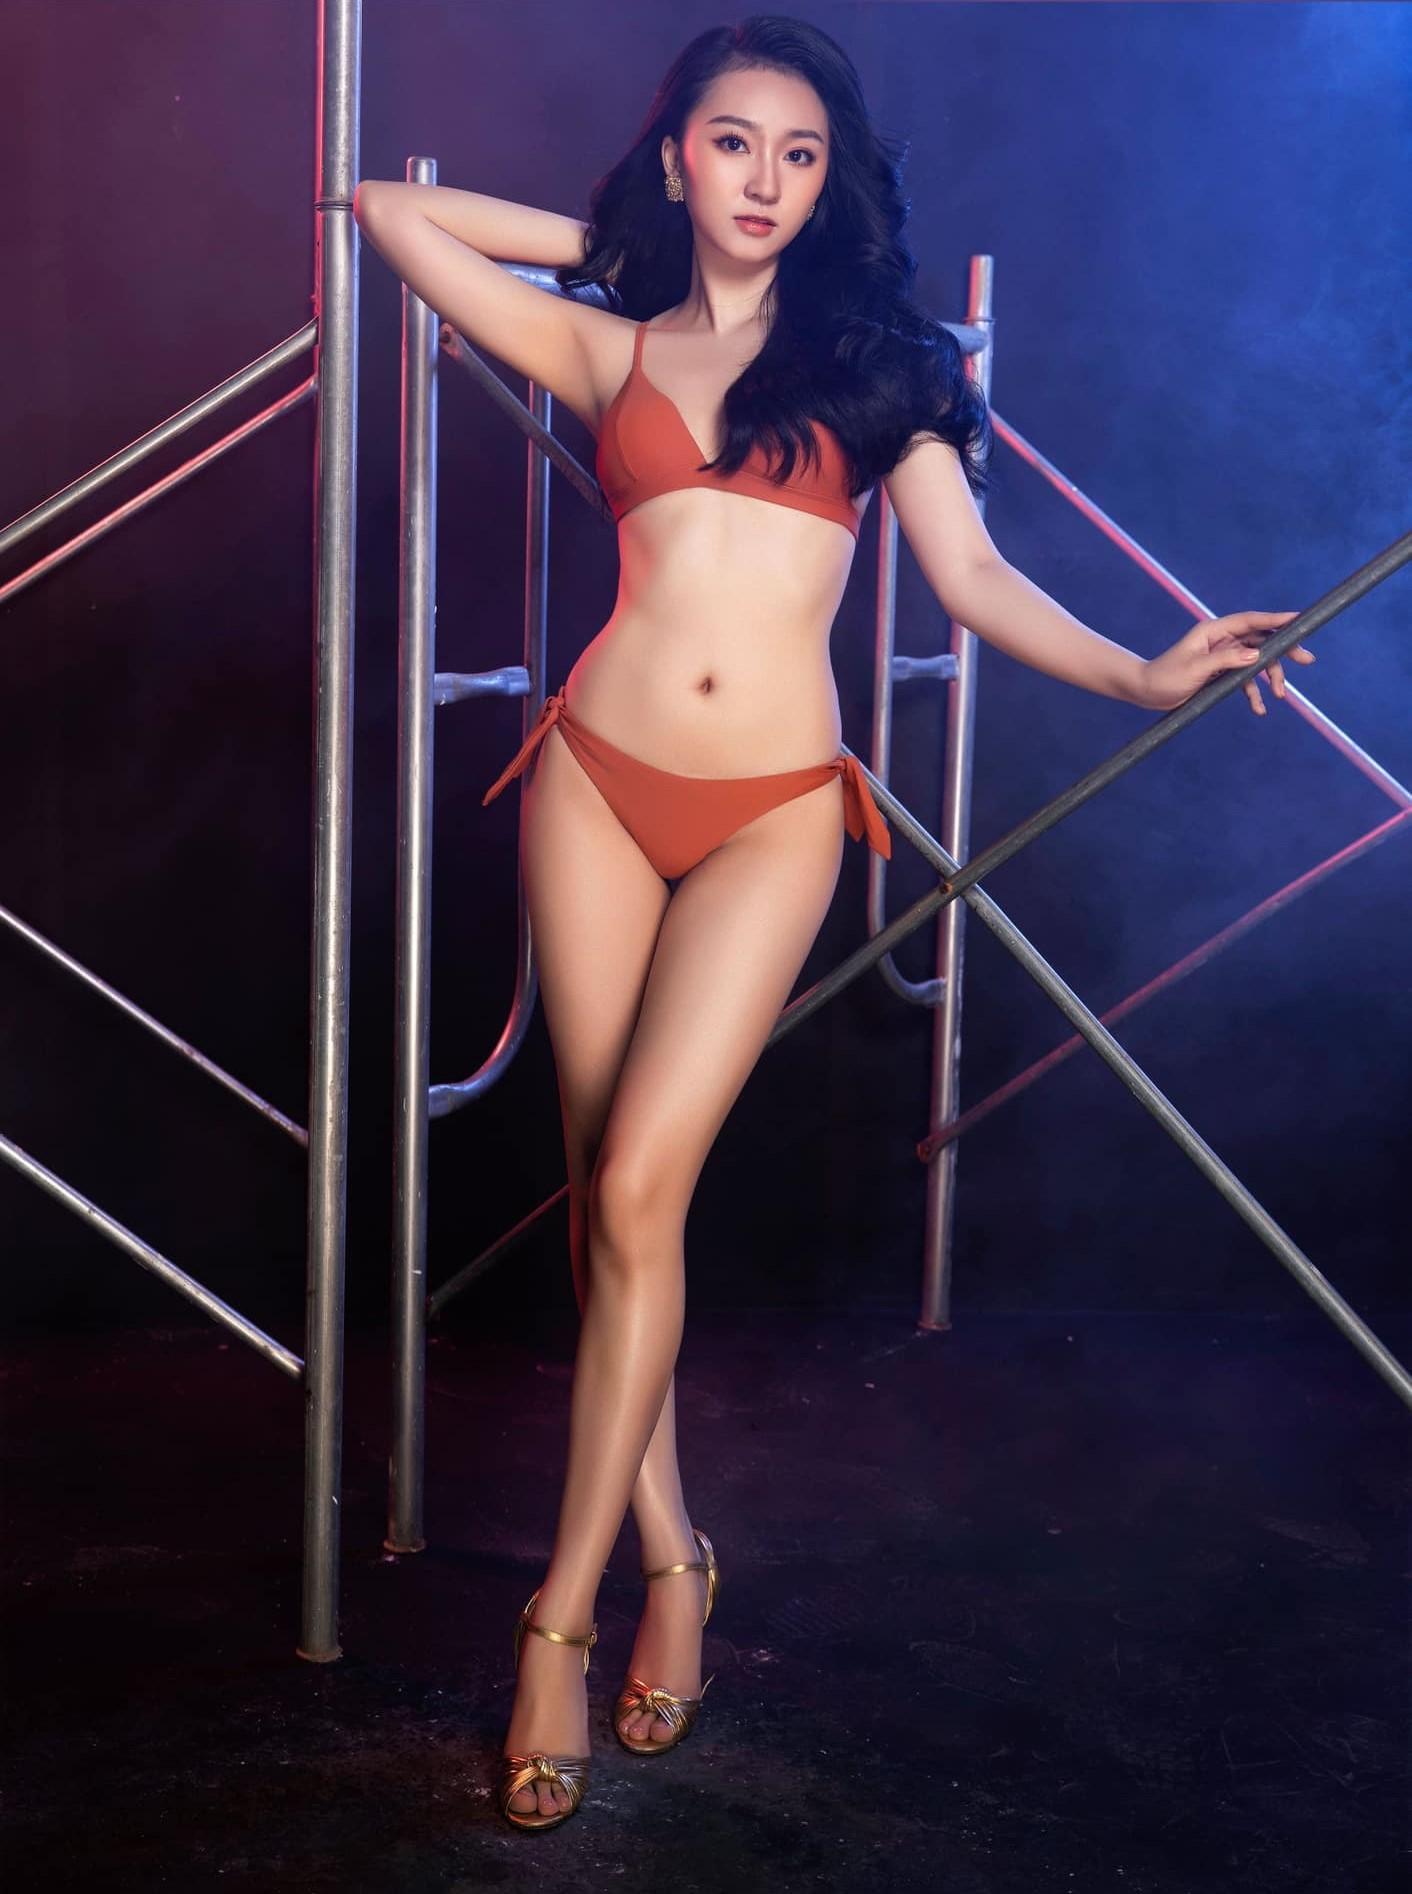 Hoa hậu Việt Nam 2020 Kim Trà My 2